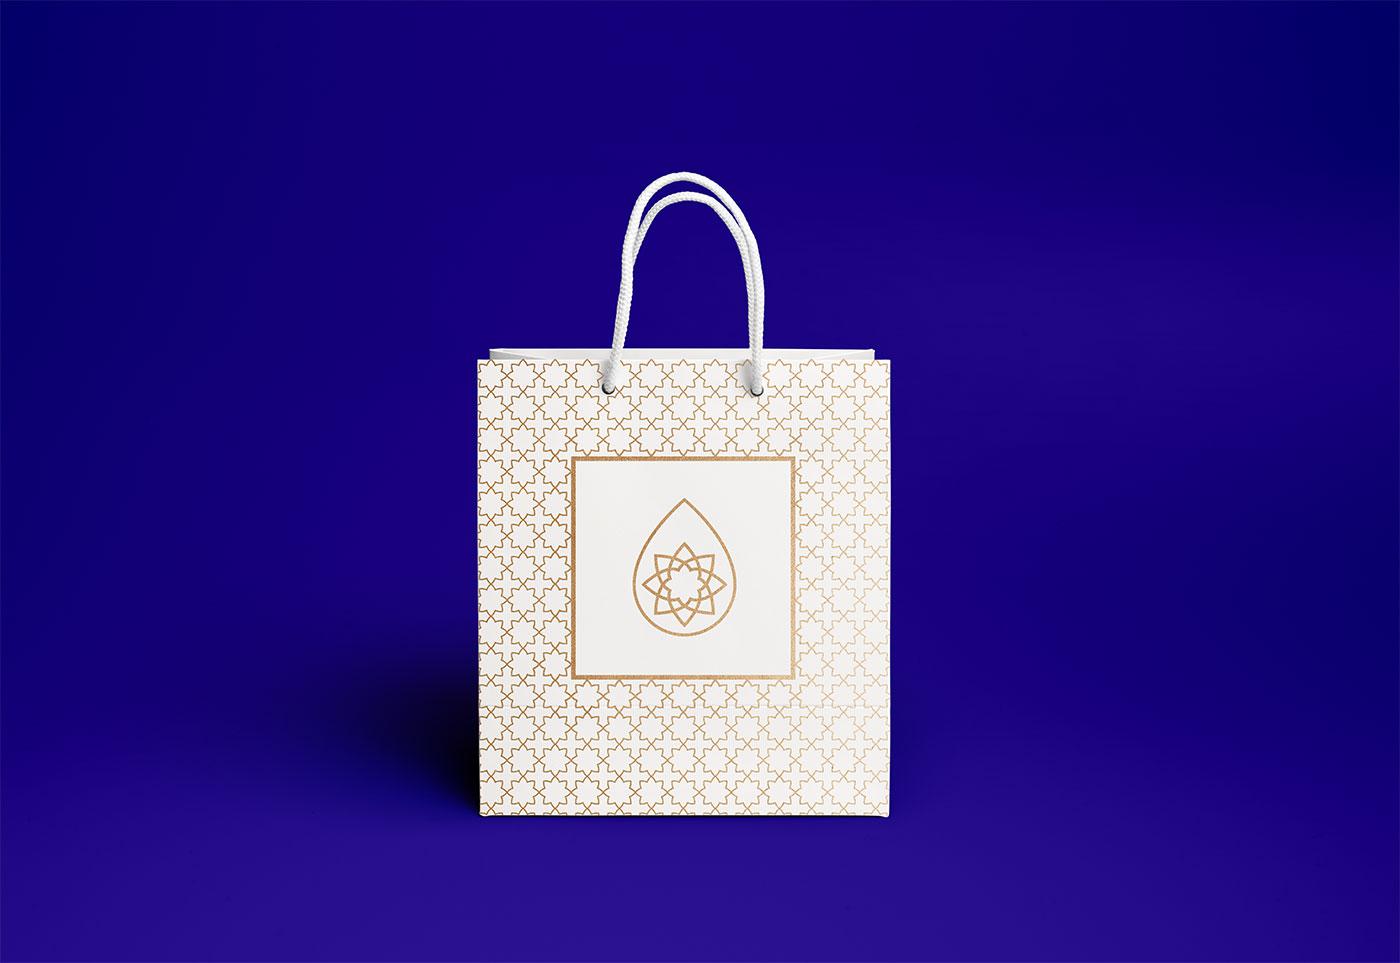 Outfit Branding & Design Sol Water Bag